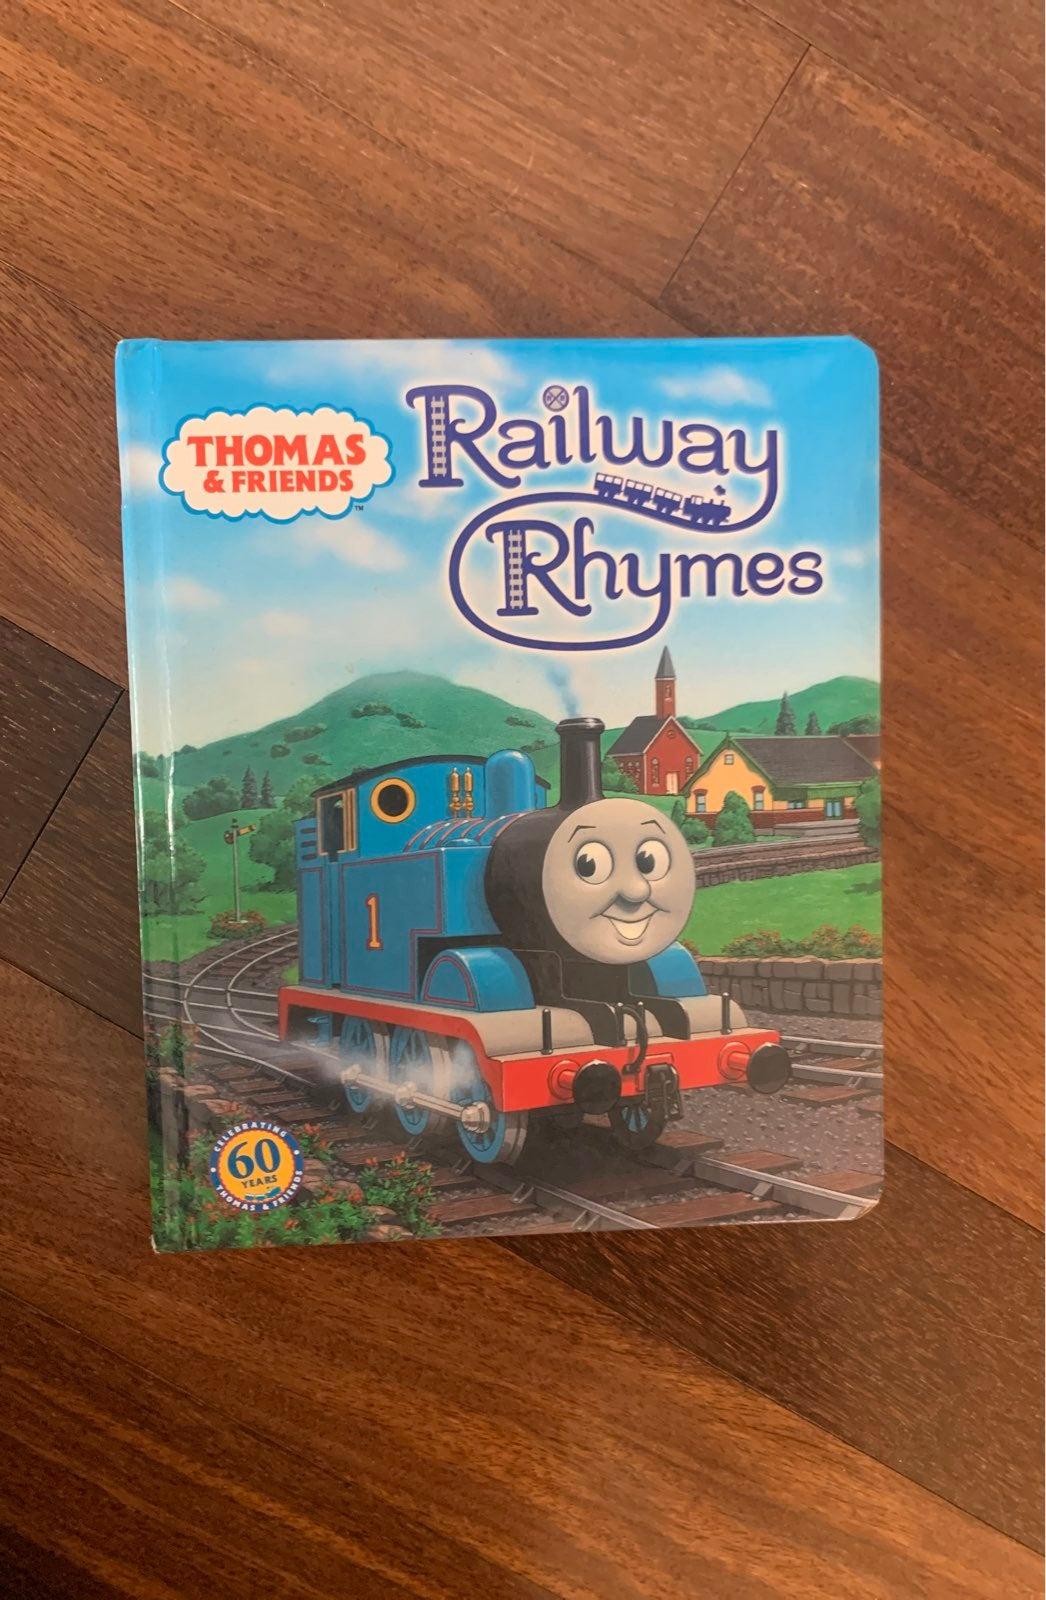 Thomas the Train Railway Rhymes Book